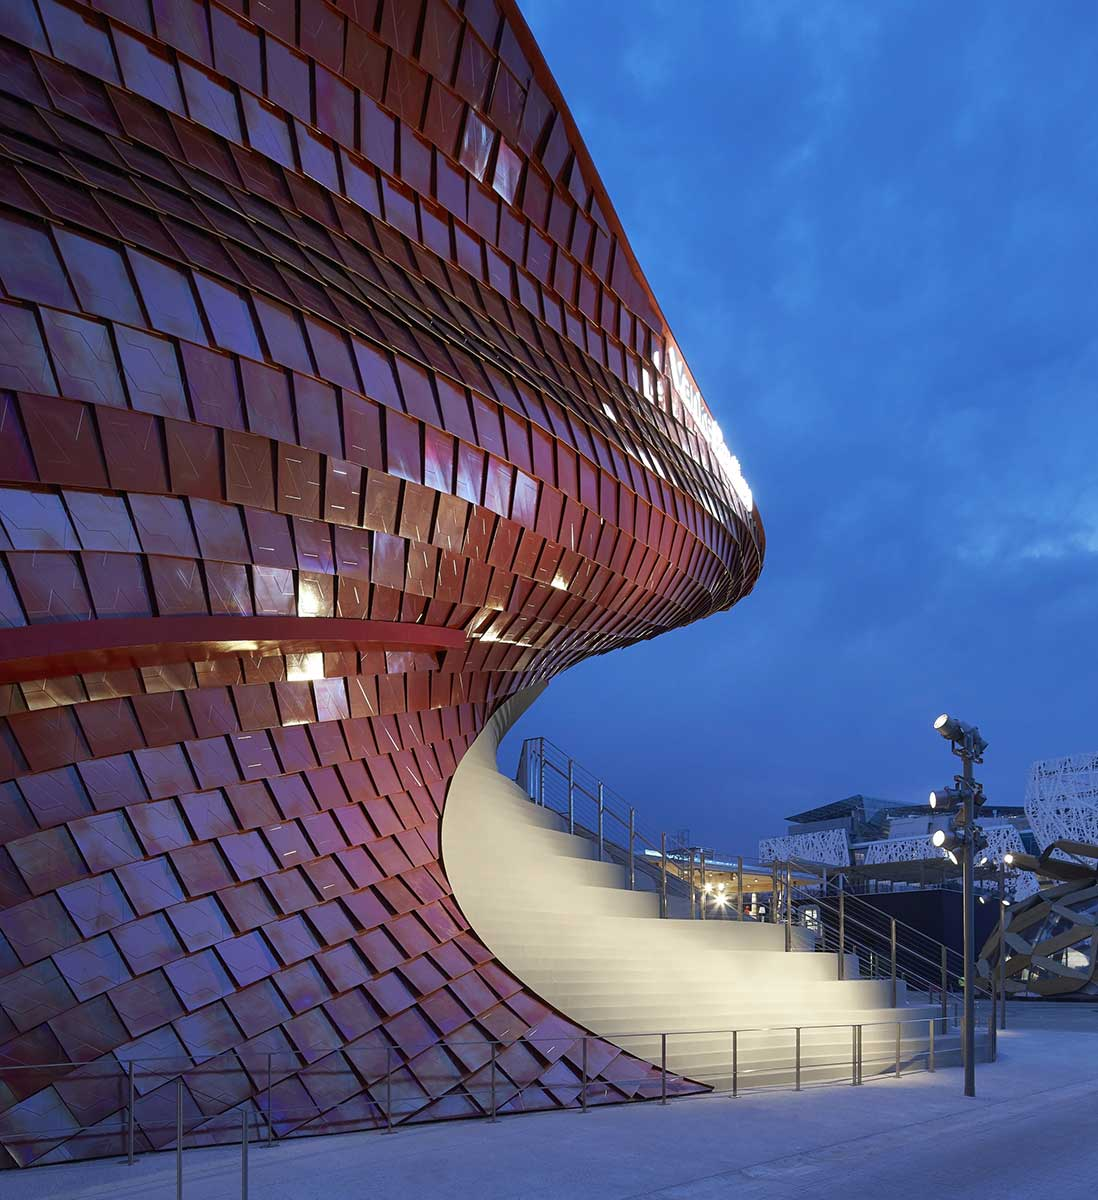 studio-libeskind_vanke-pavilion_expo-2015_huftoncrow_007-2280x2491.jpg